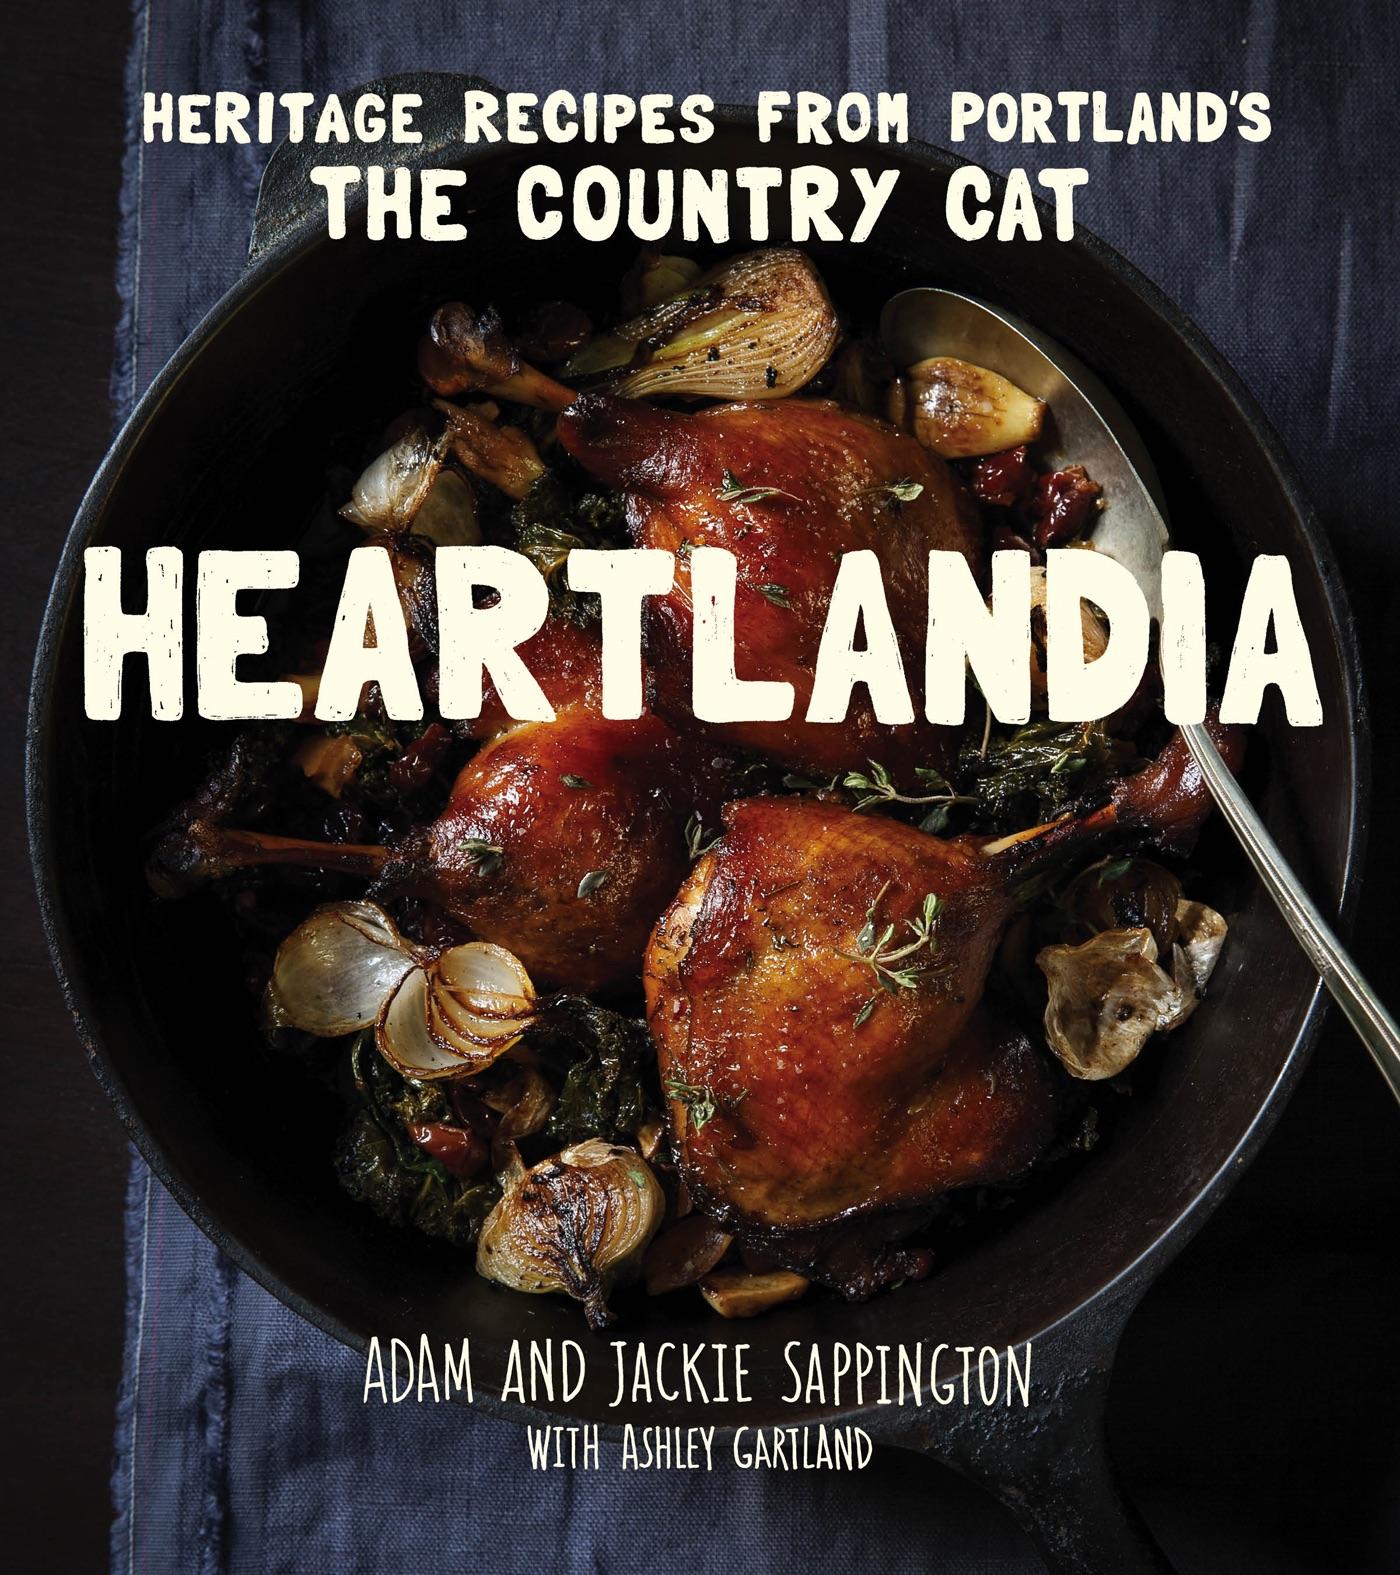 The Heartlandia cookbook by Adam and Jackie Sappington.